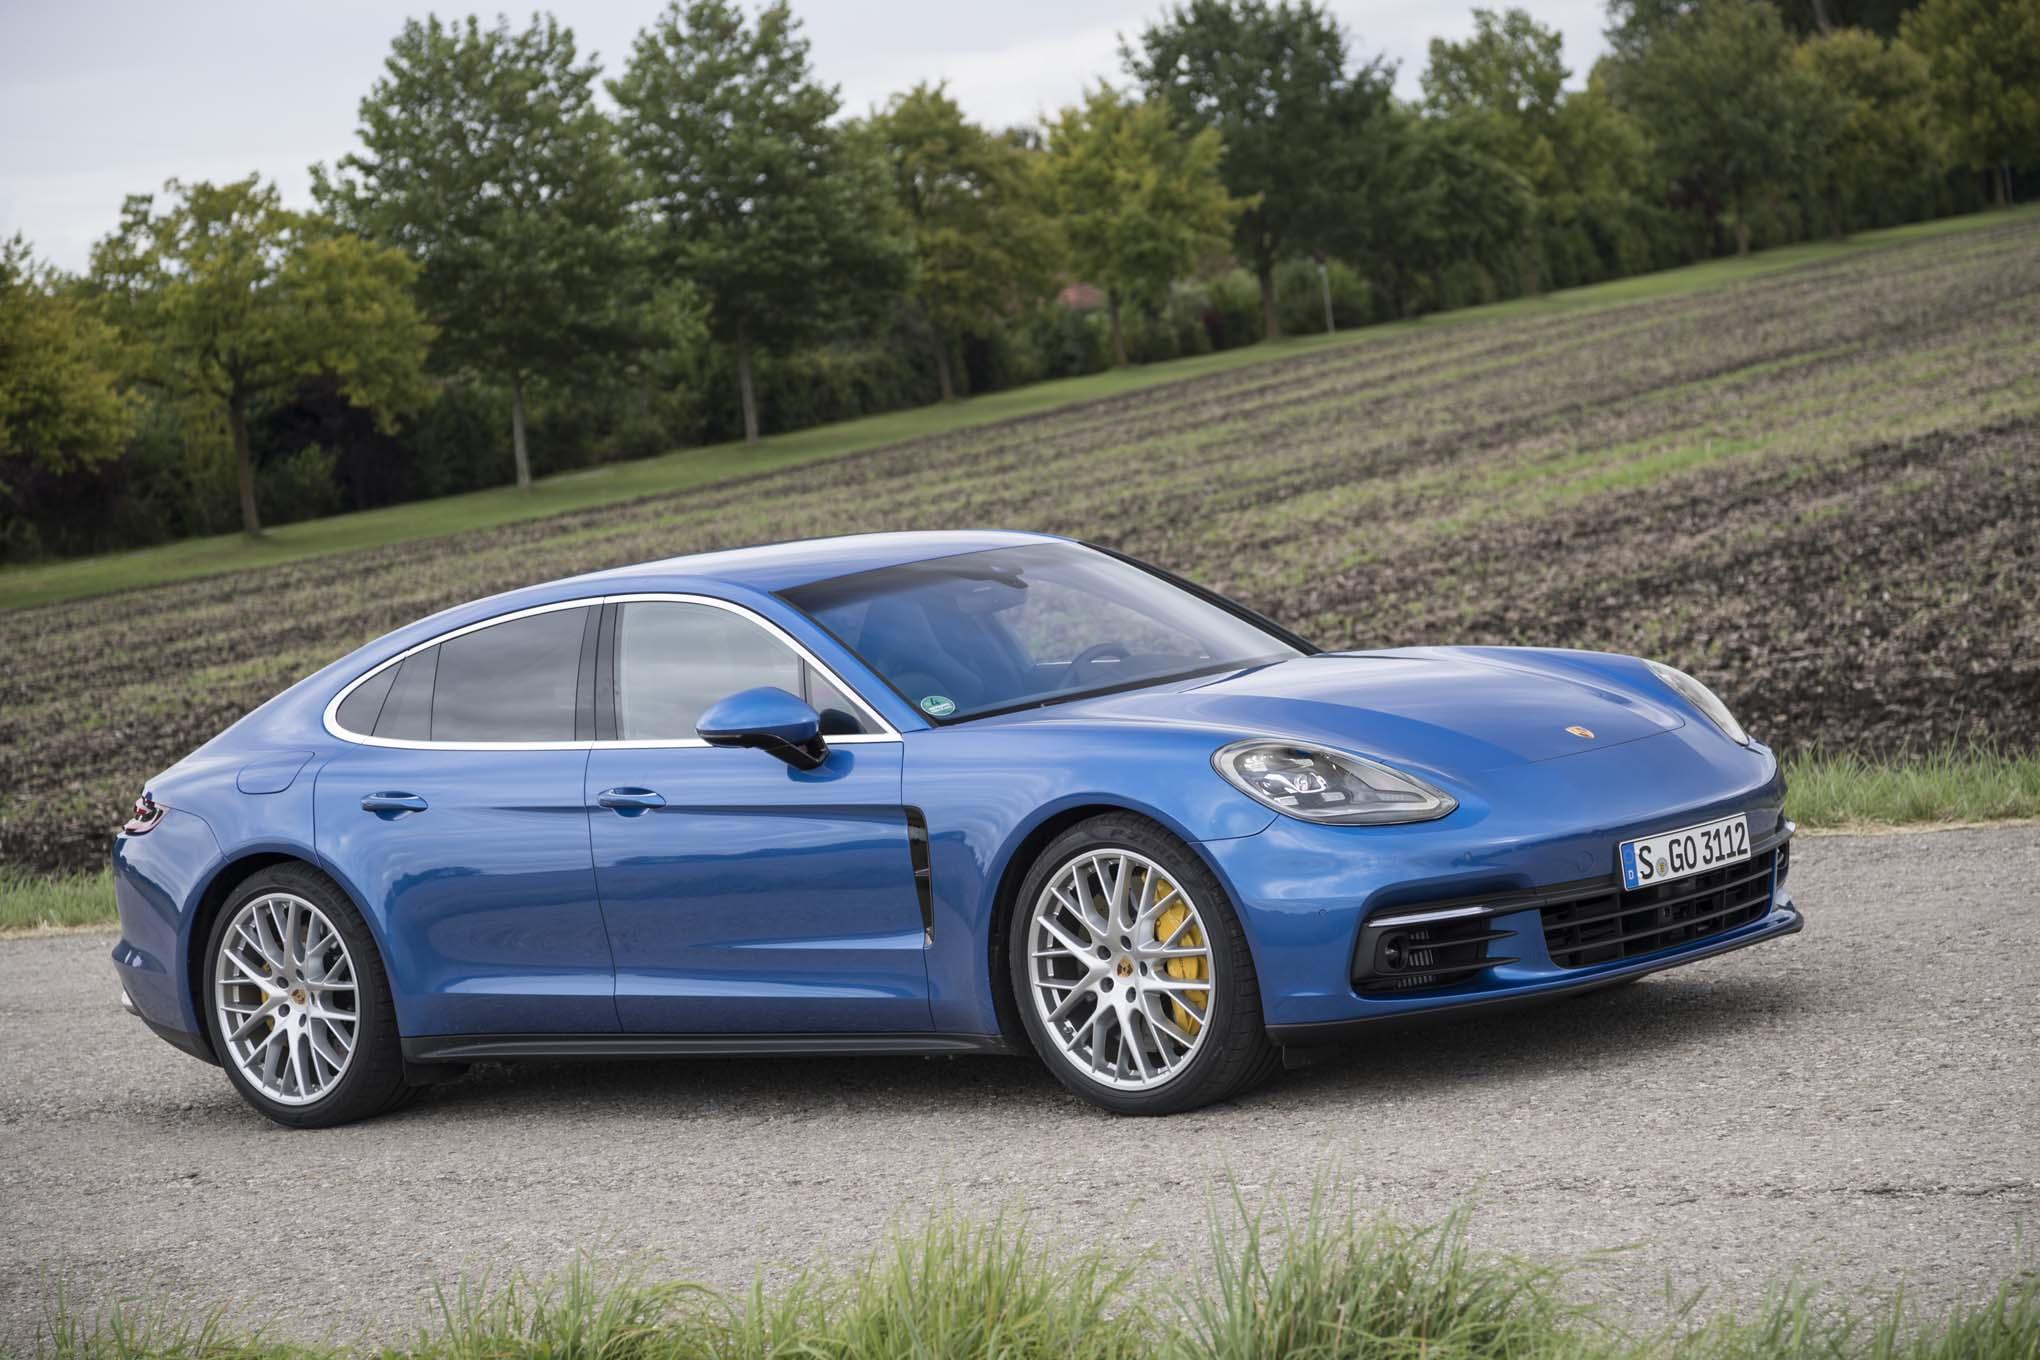 2018 Porsche Panamera Review >> 2017 Porsche Panamera 4S First Drive Review | Automobile Magazine